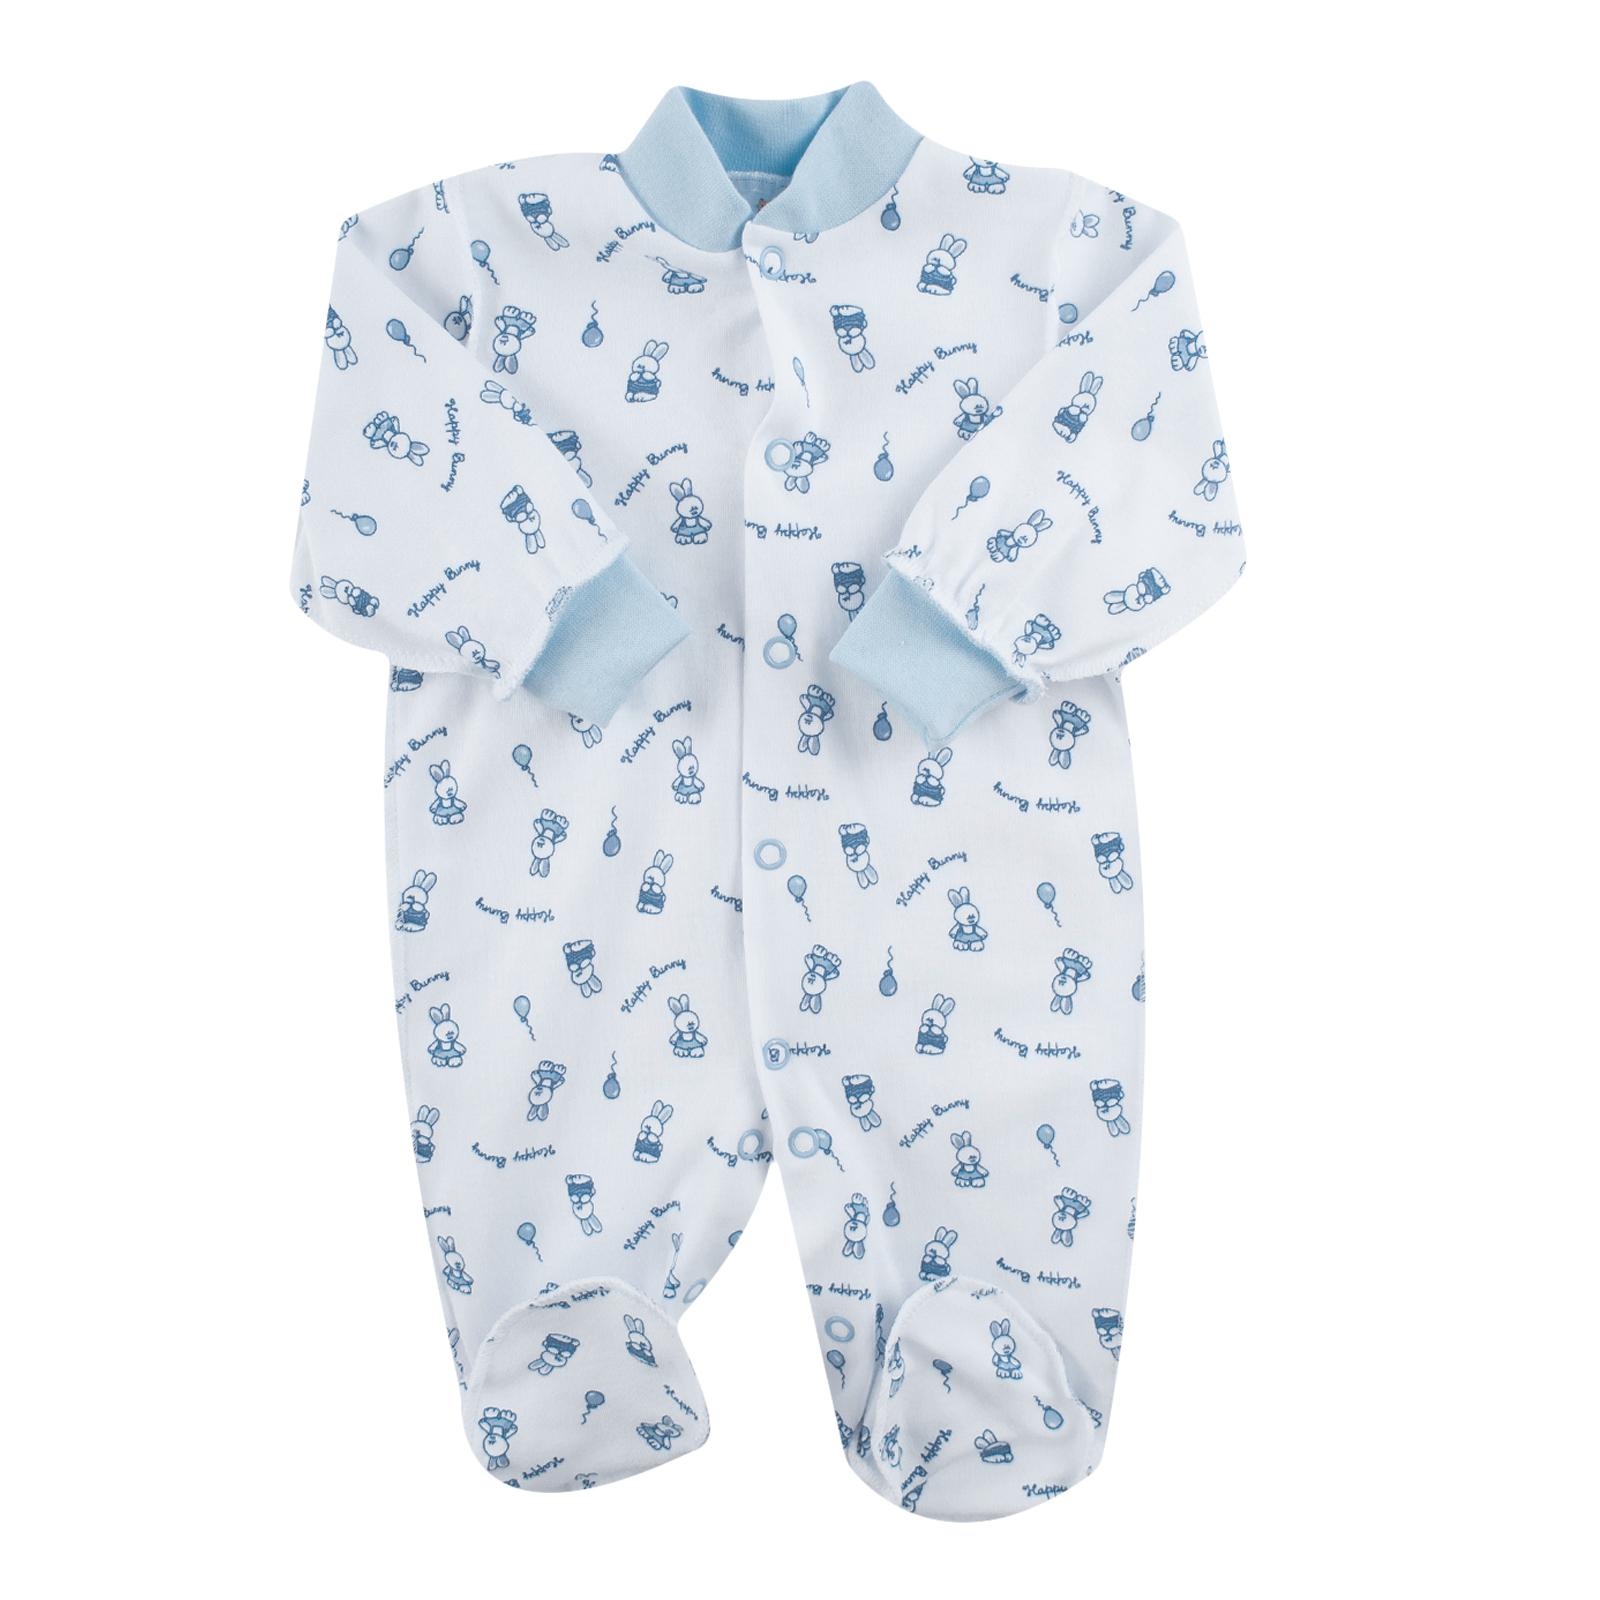 Комбинезон КОТМАРКОТ для мальчика, цвет набивка голубой тон 6-9 мес (размер 74)